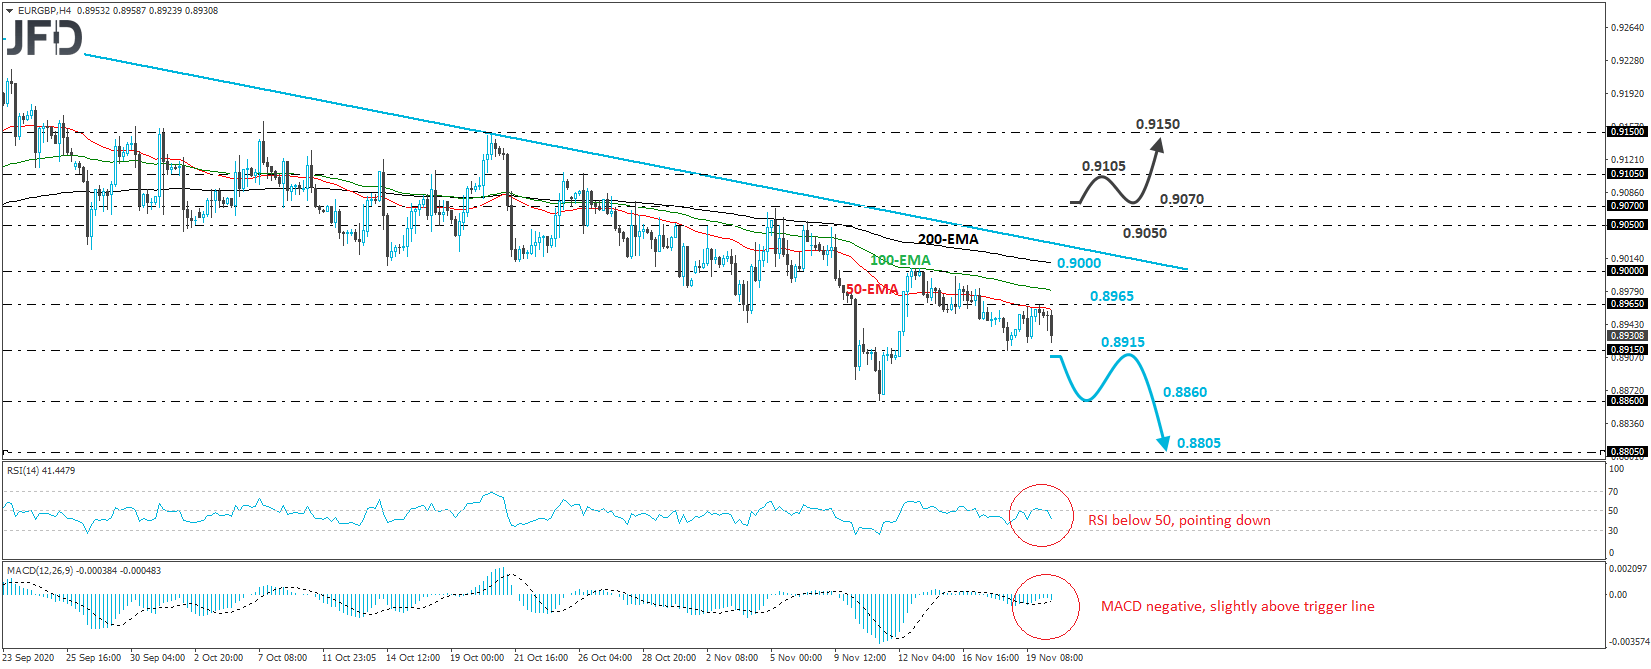 EUR/GBP 4-hour chart technical analysis